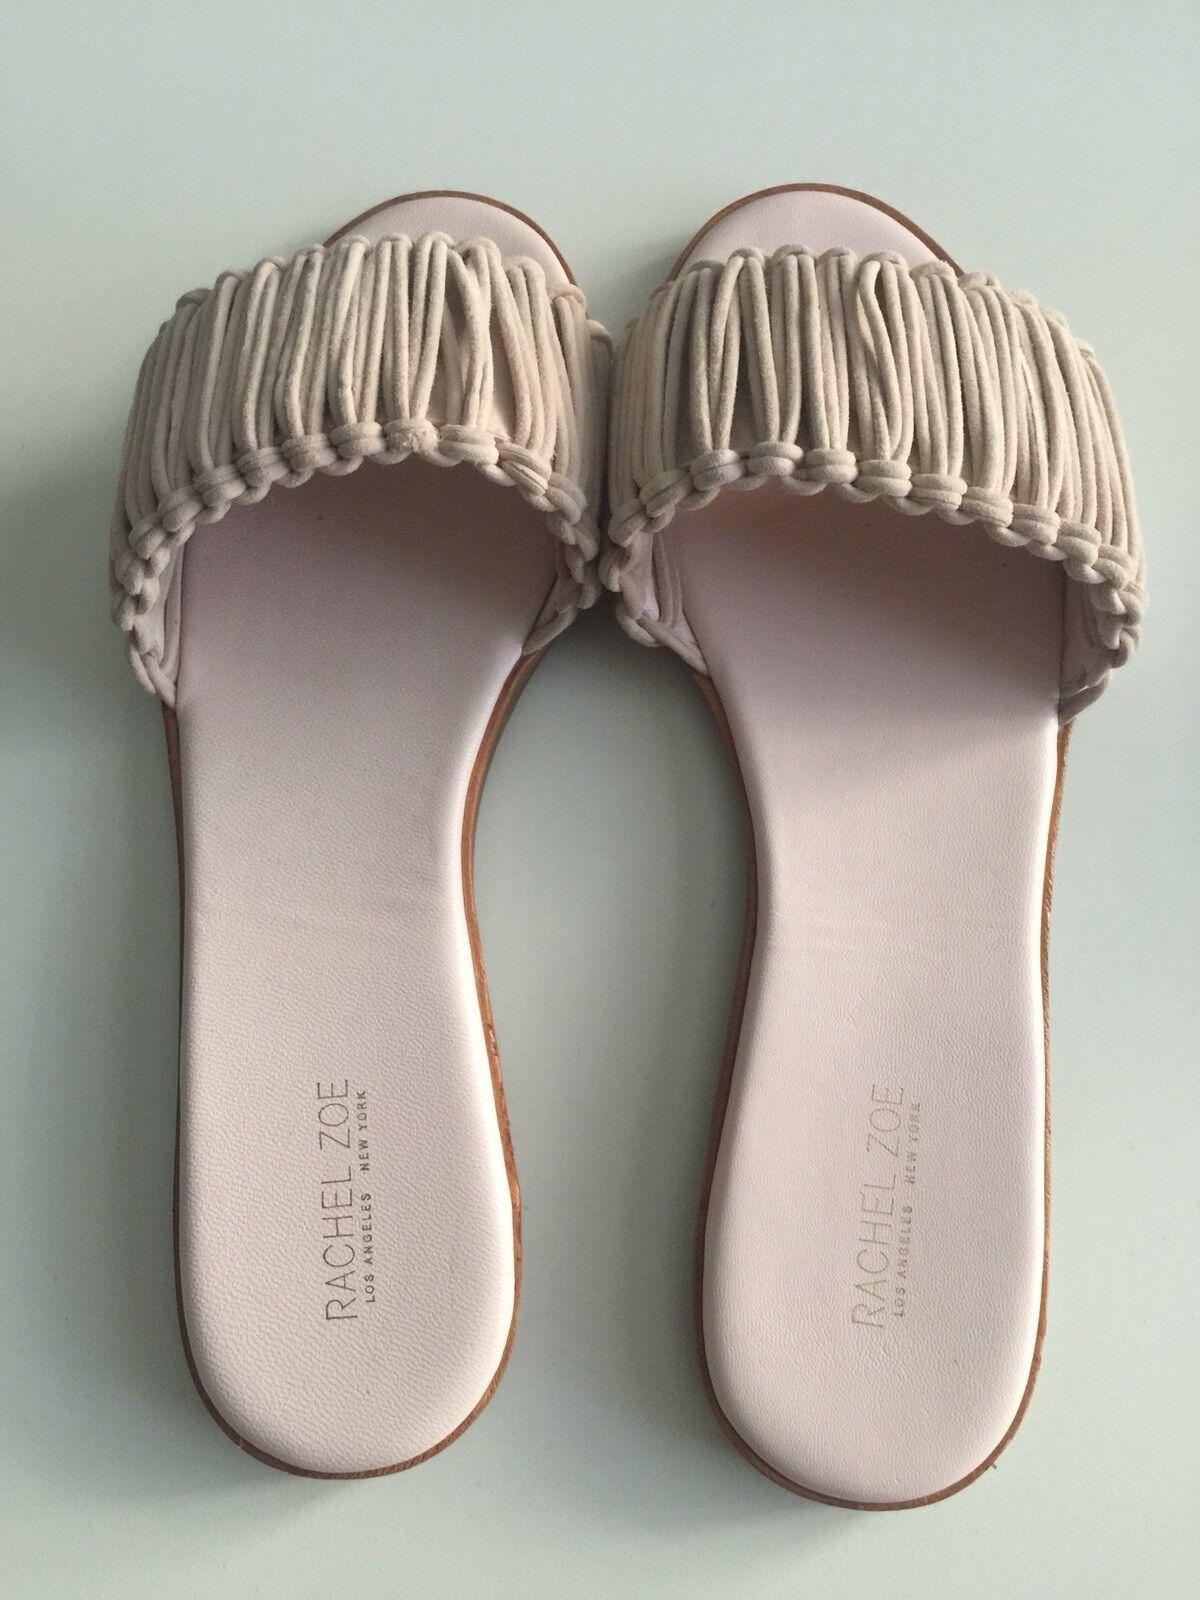 Rachel Zoe donna's Raina Blush Flat Sandal, Dimensione 7, brand new